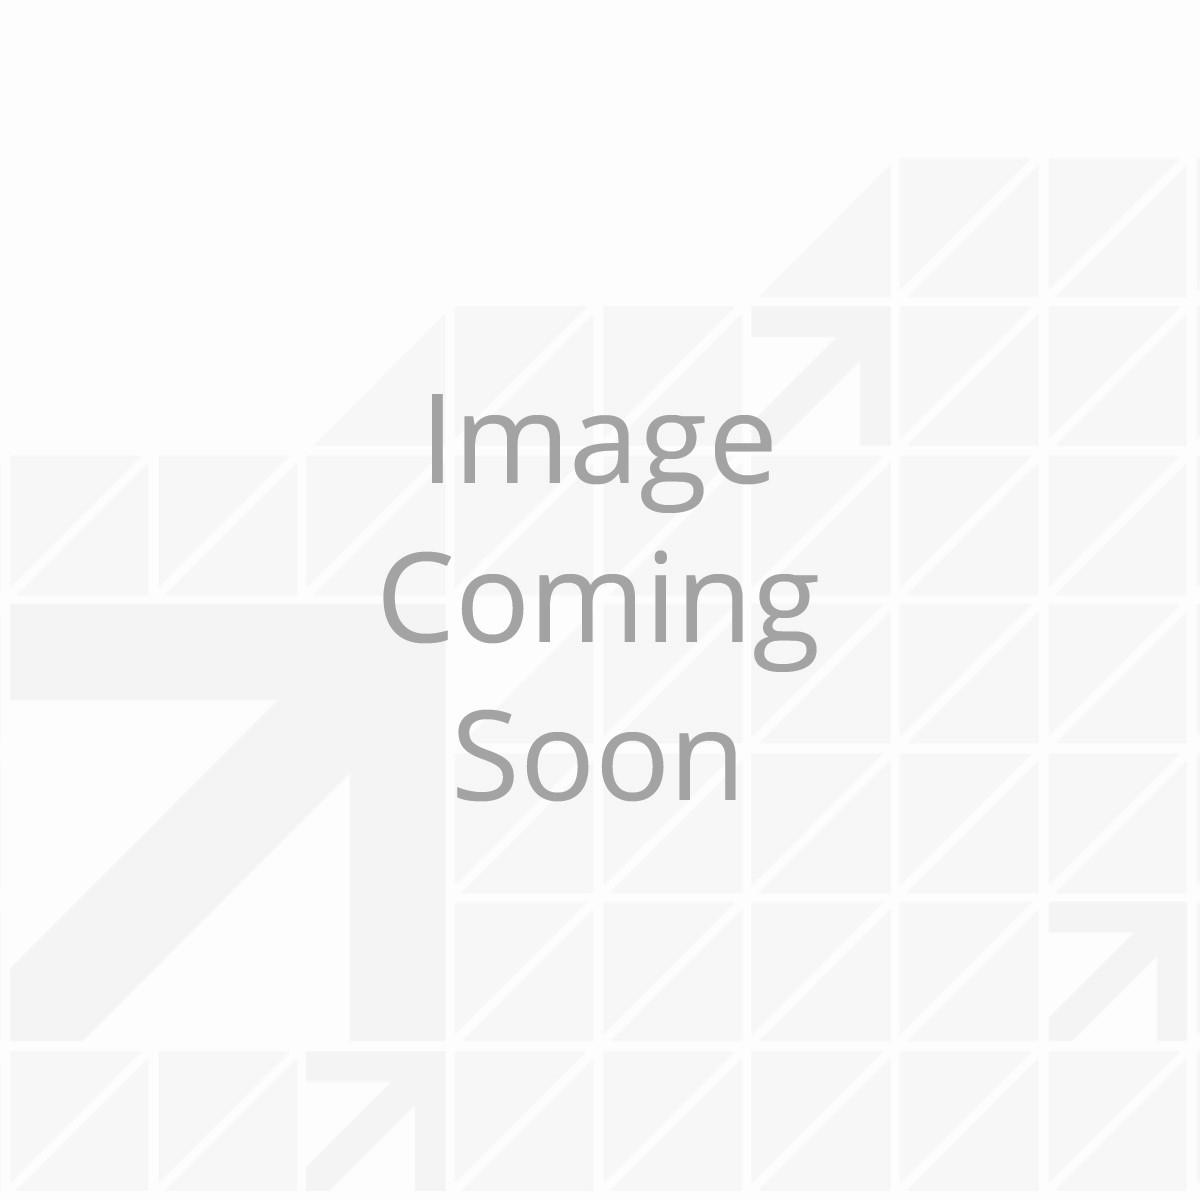 17' Power & Hybrid Awning Roller Assembly - Prepflex Solid Black